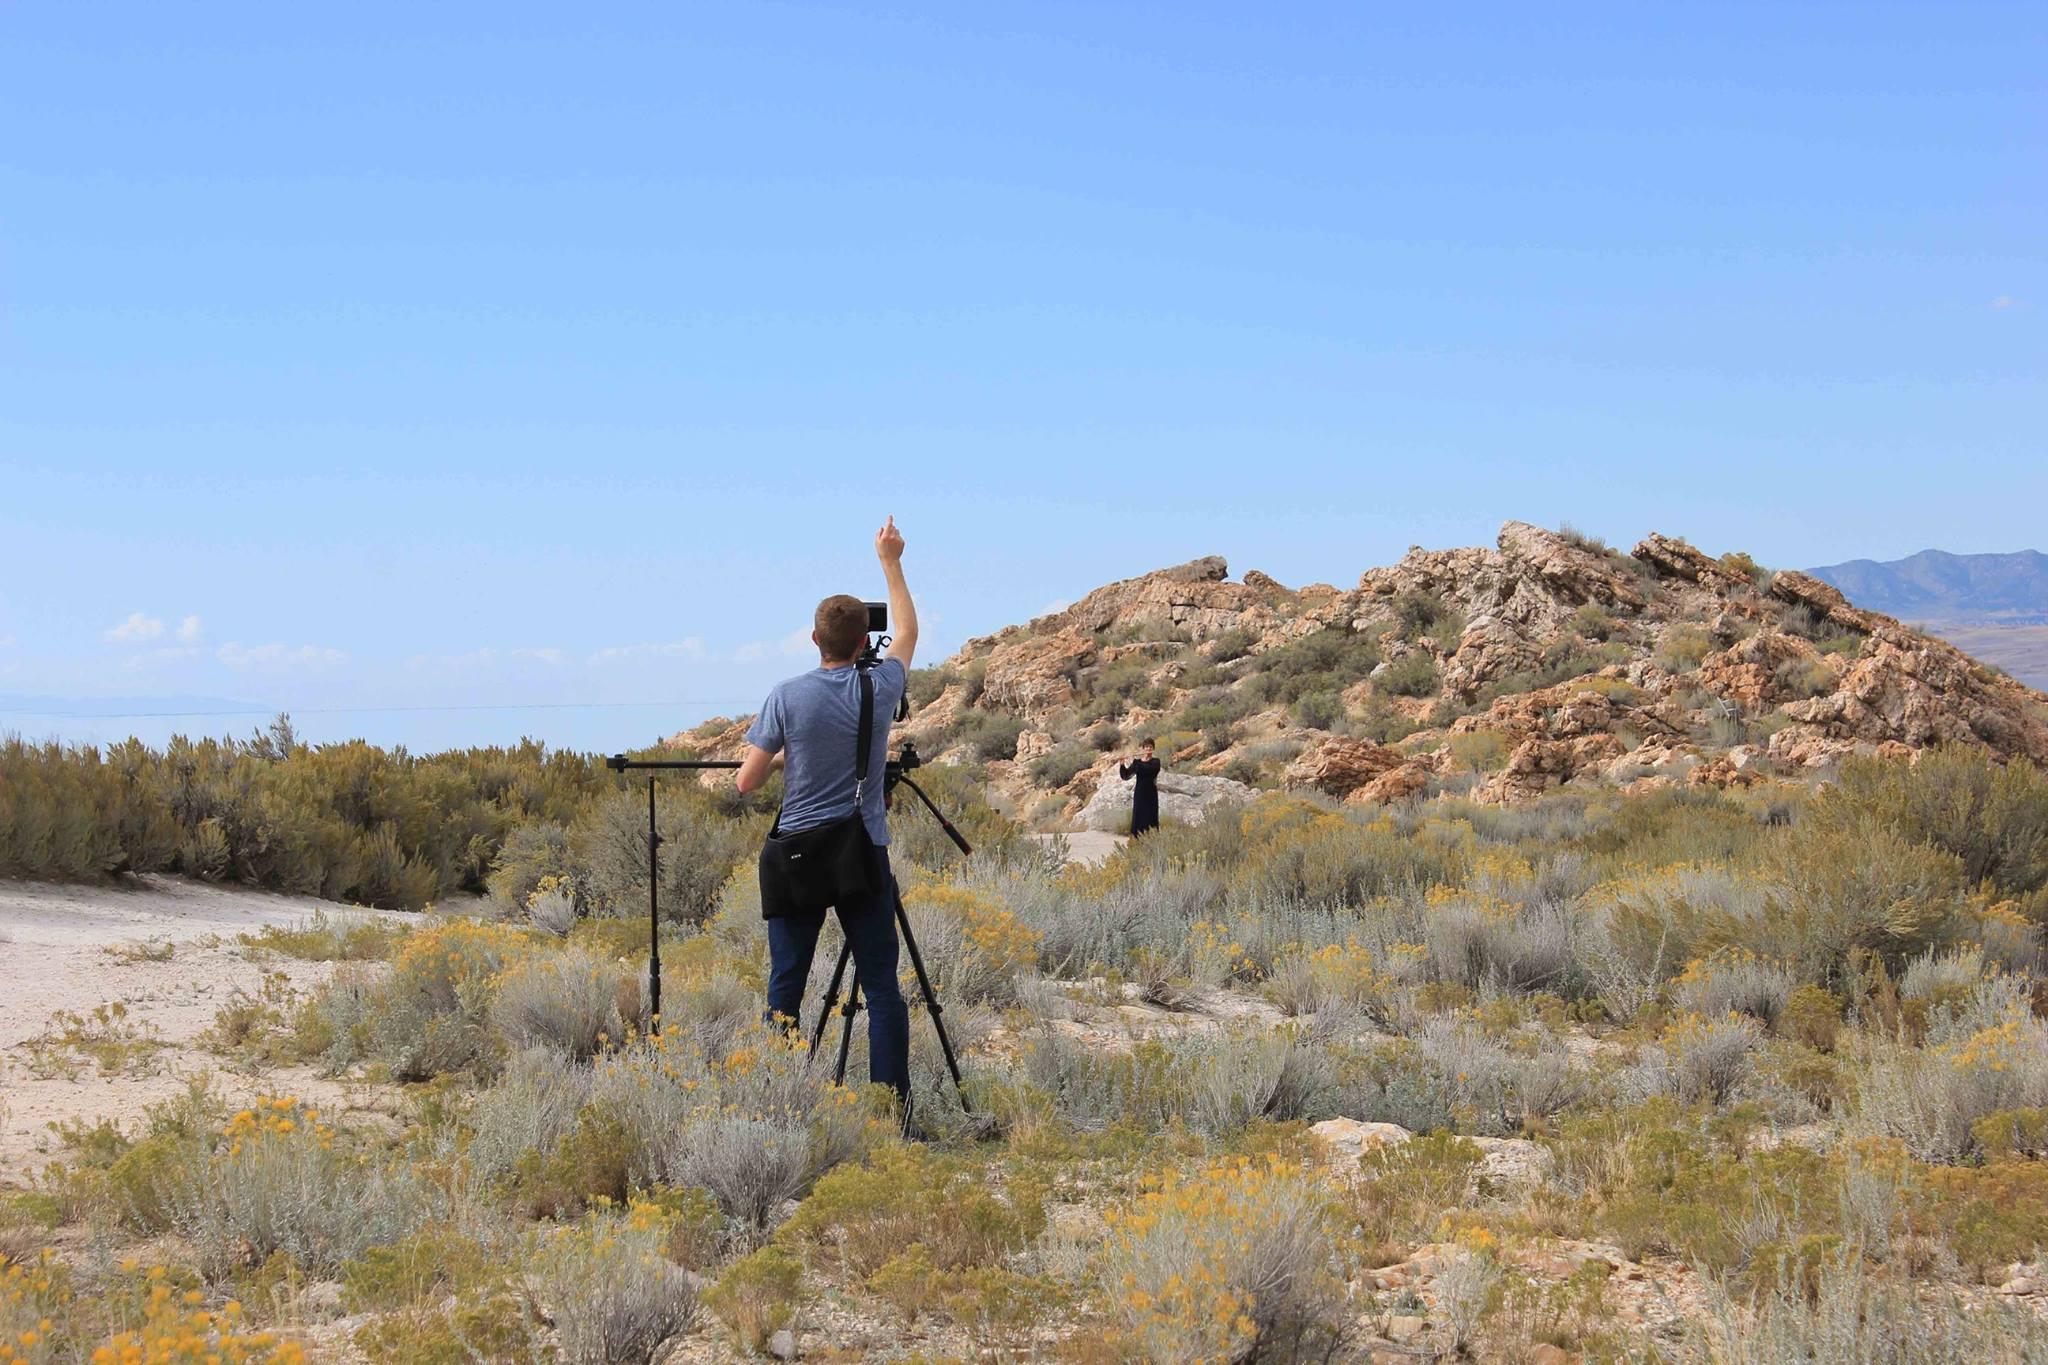 Jeannine Goeckeritz - Flute - Behind the Scenes - Music Video Shoot - Media.jpg